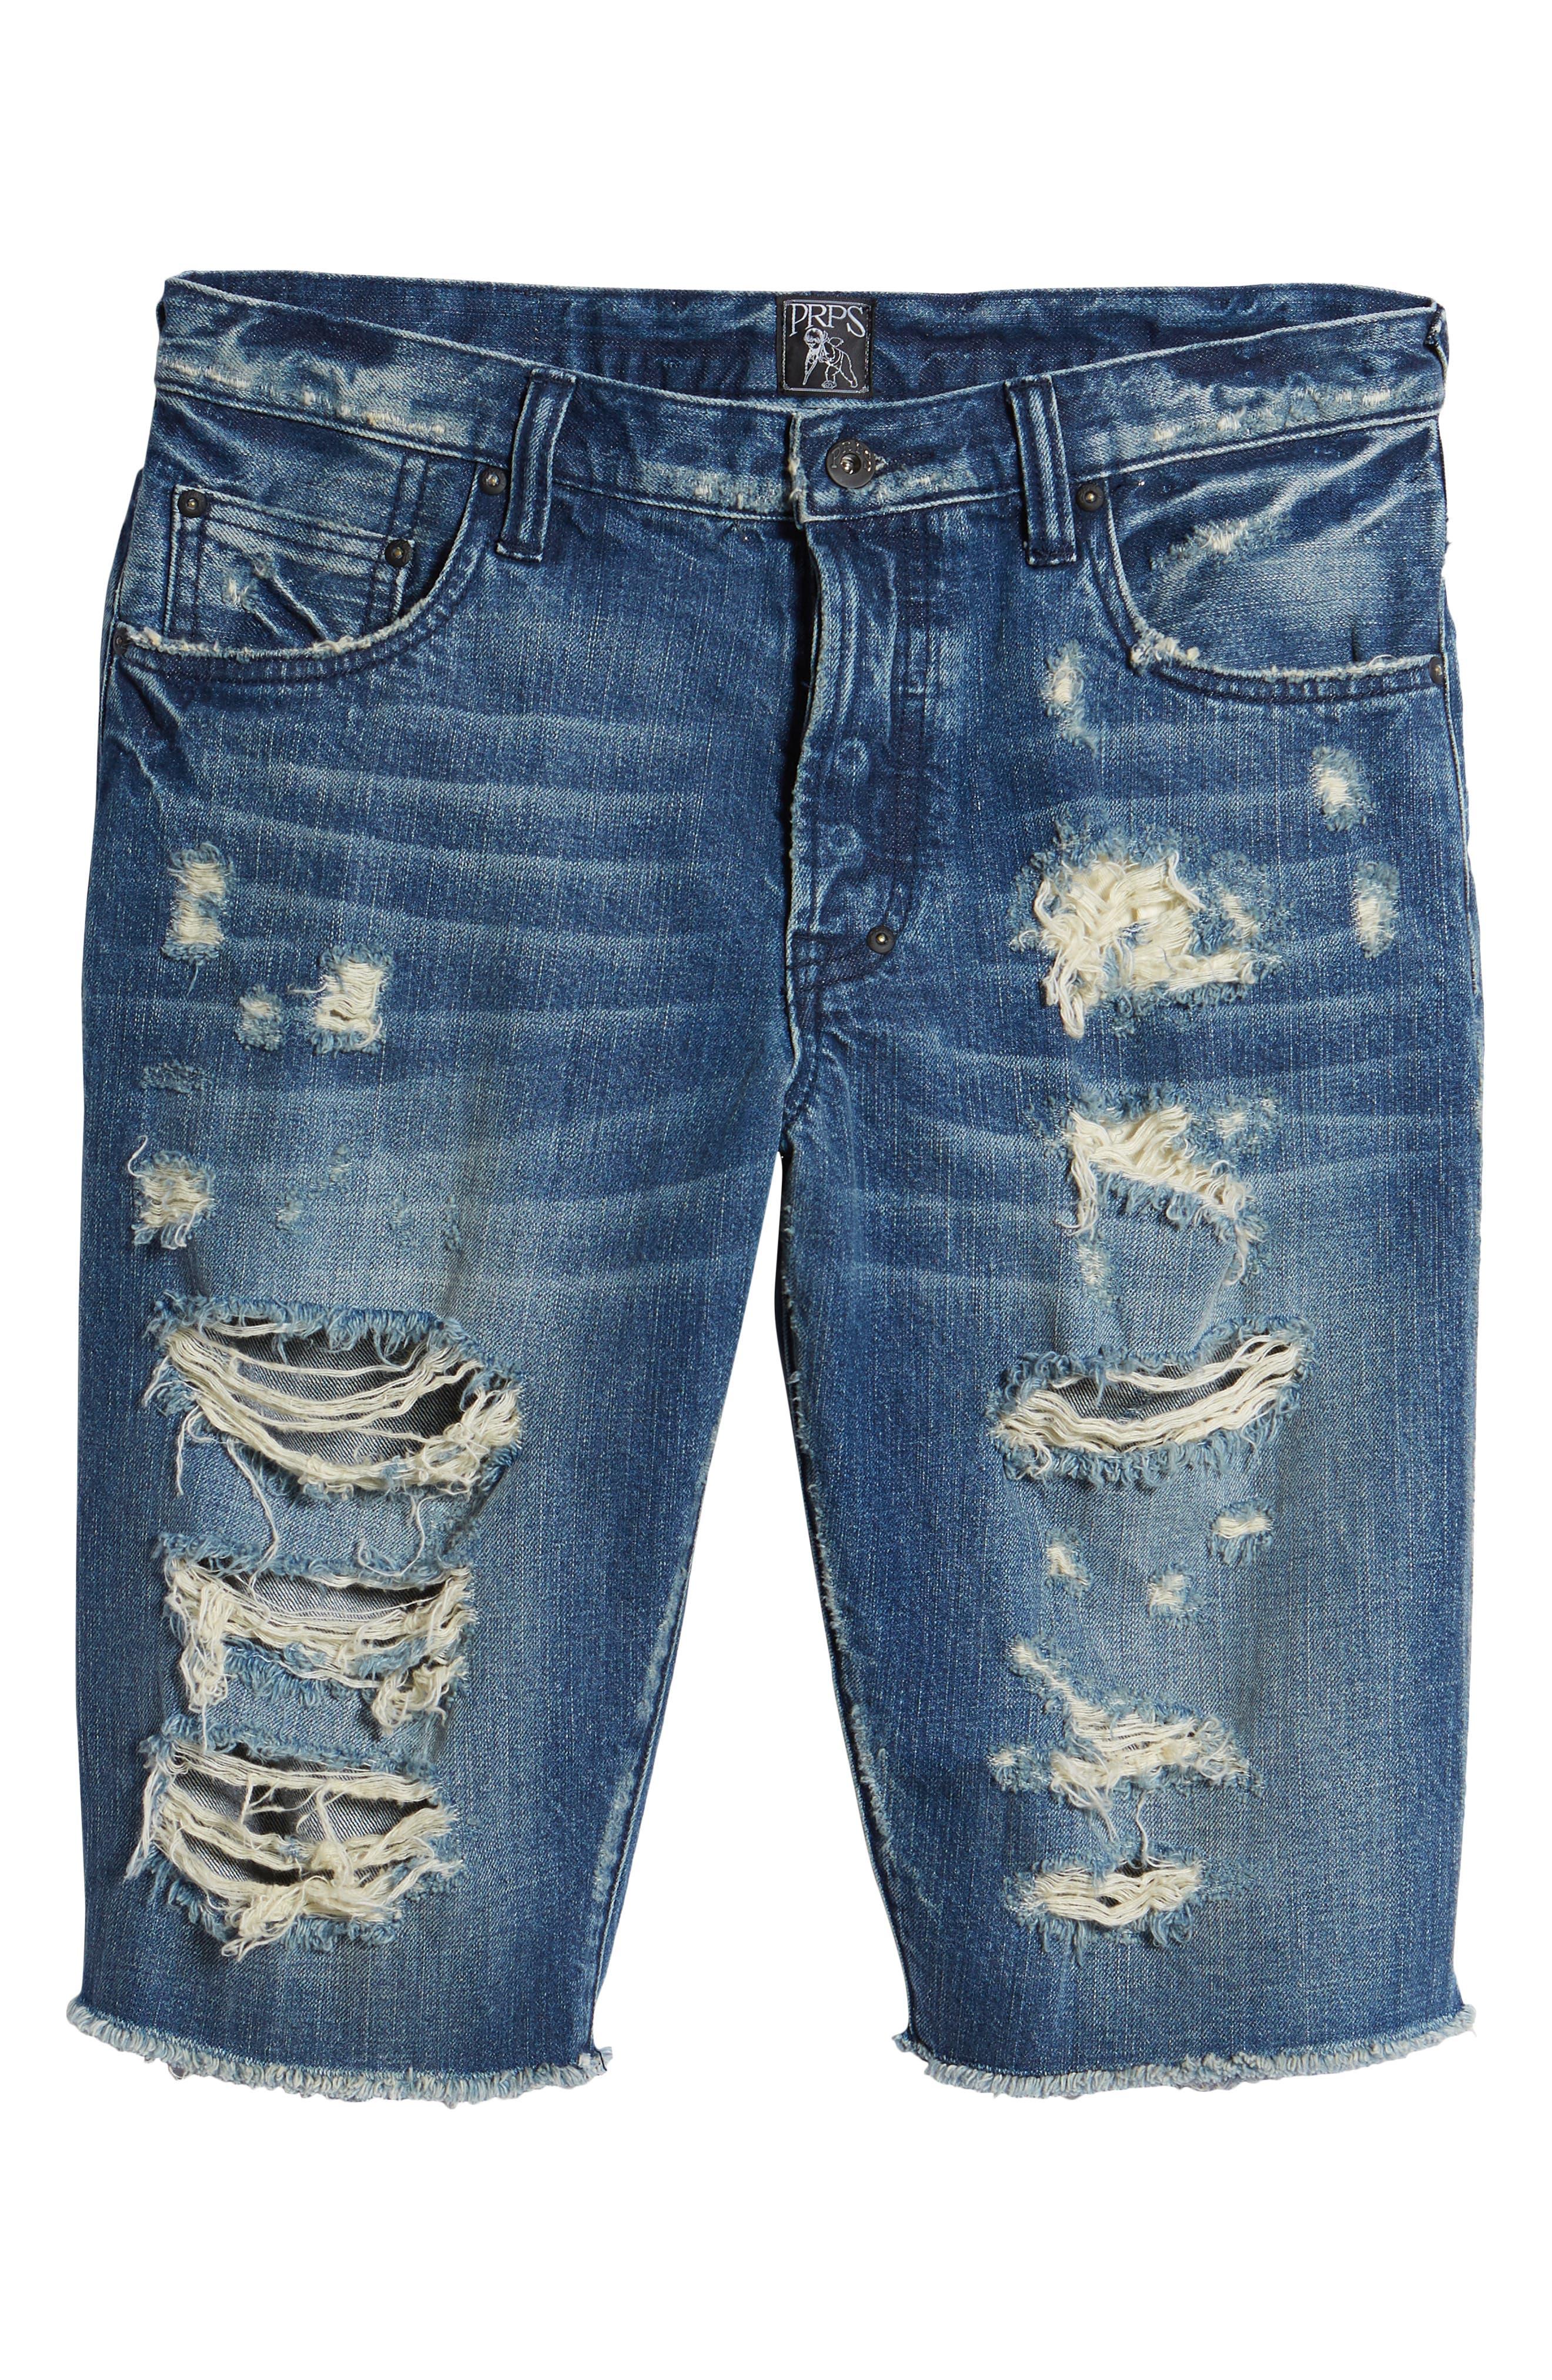 Challenger Regular Fit Shorts,                             Alternate thumbnail 6, color,                             WHISPERING